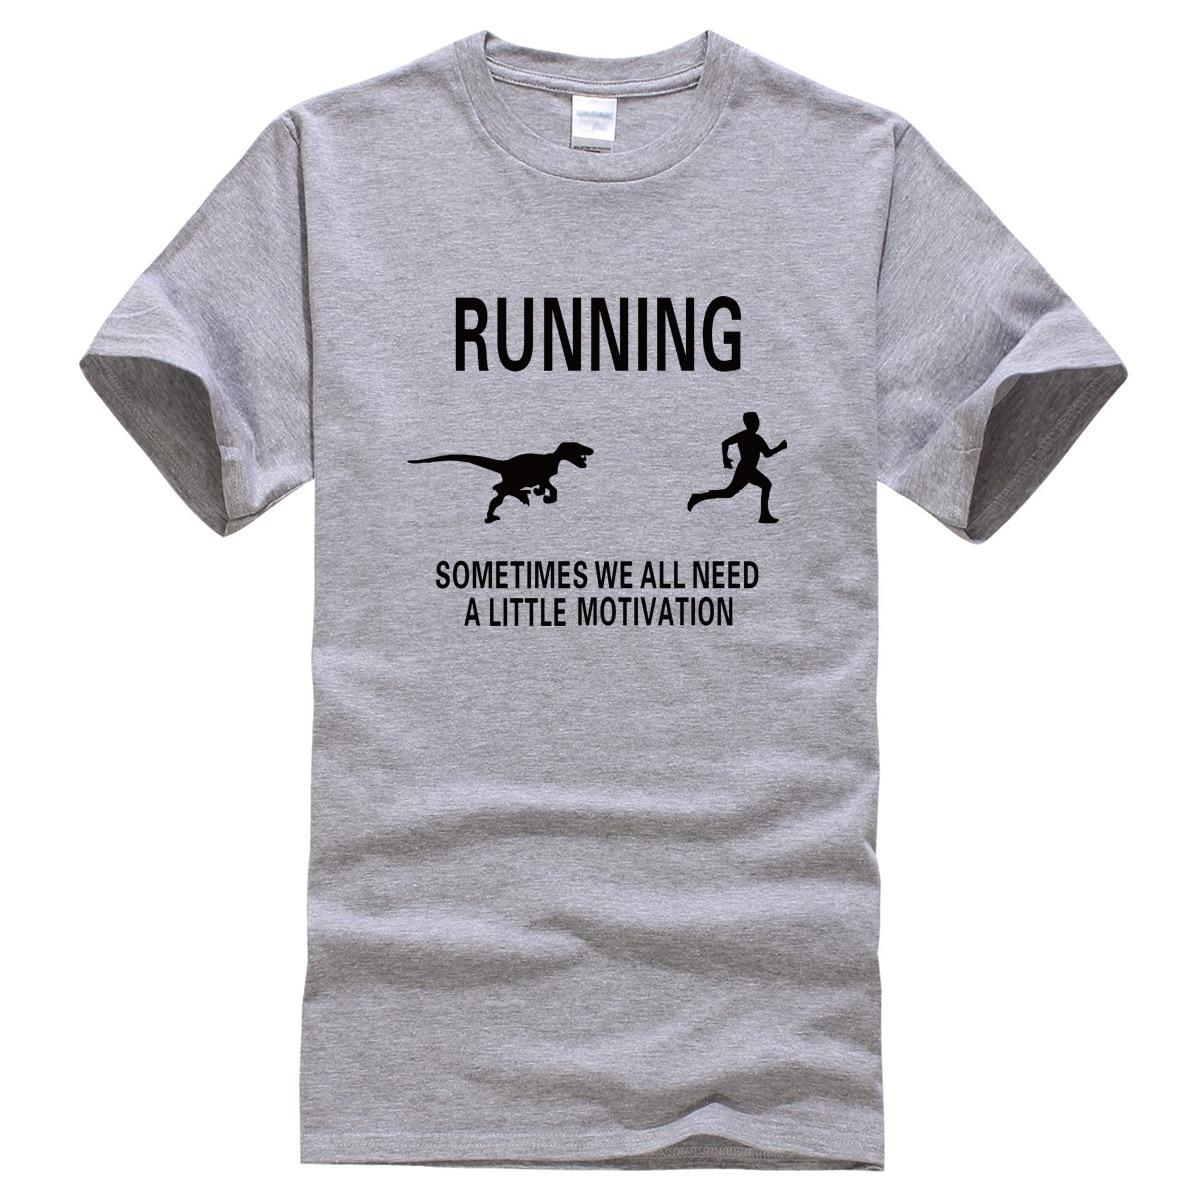 2017 summer men's T-shirts motivation print shirt funny T-shirt brand clothing motivate runners sportwear t shirt harajuku tops